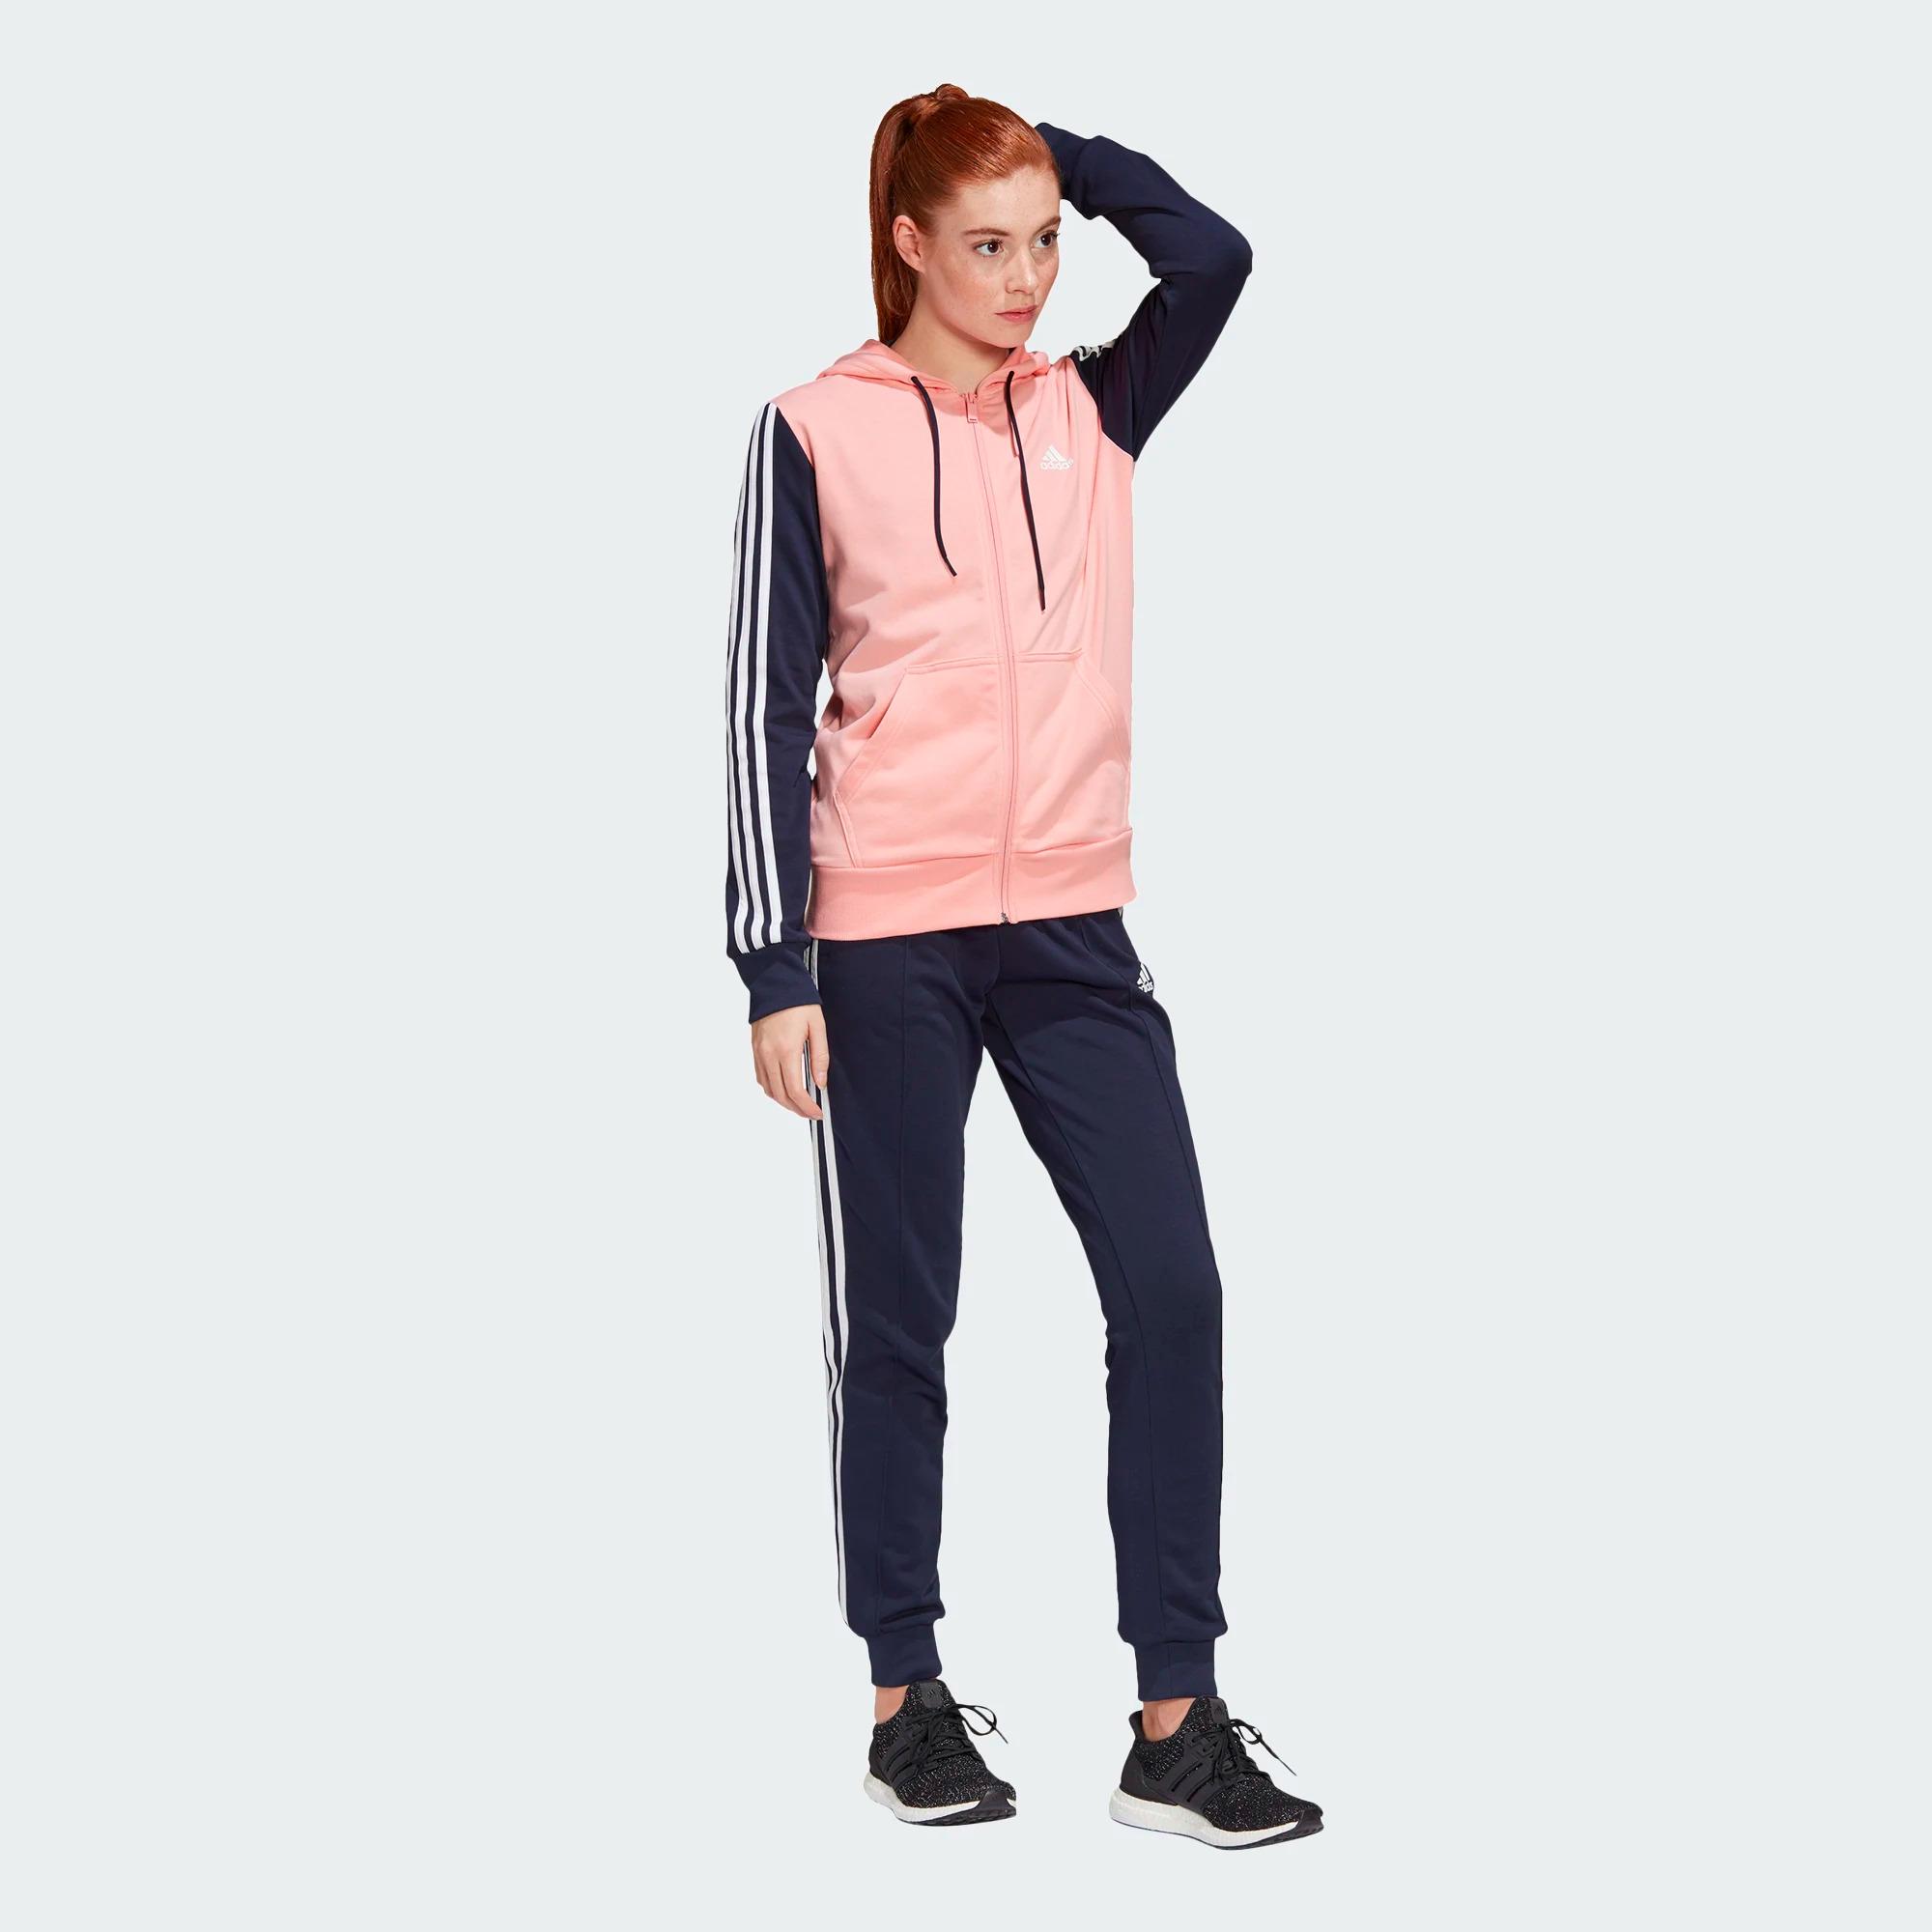 Adidas Energize Trainingsanzug Mädchen - pink/dunkelblau